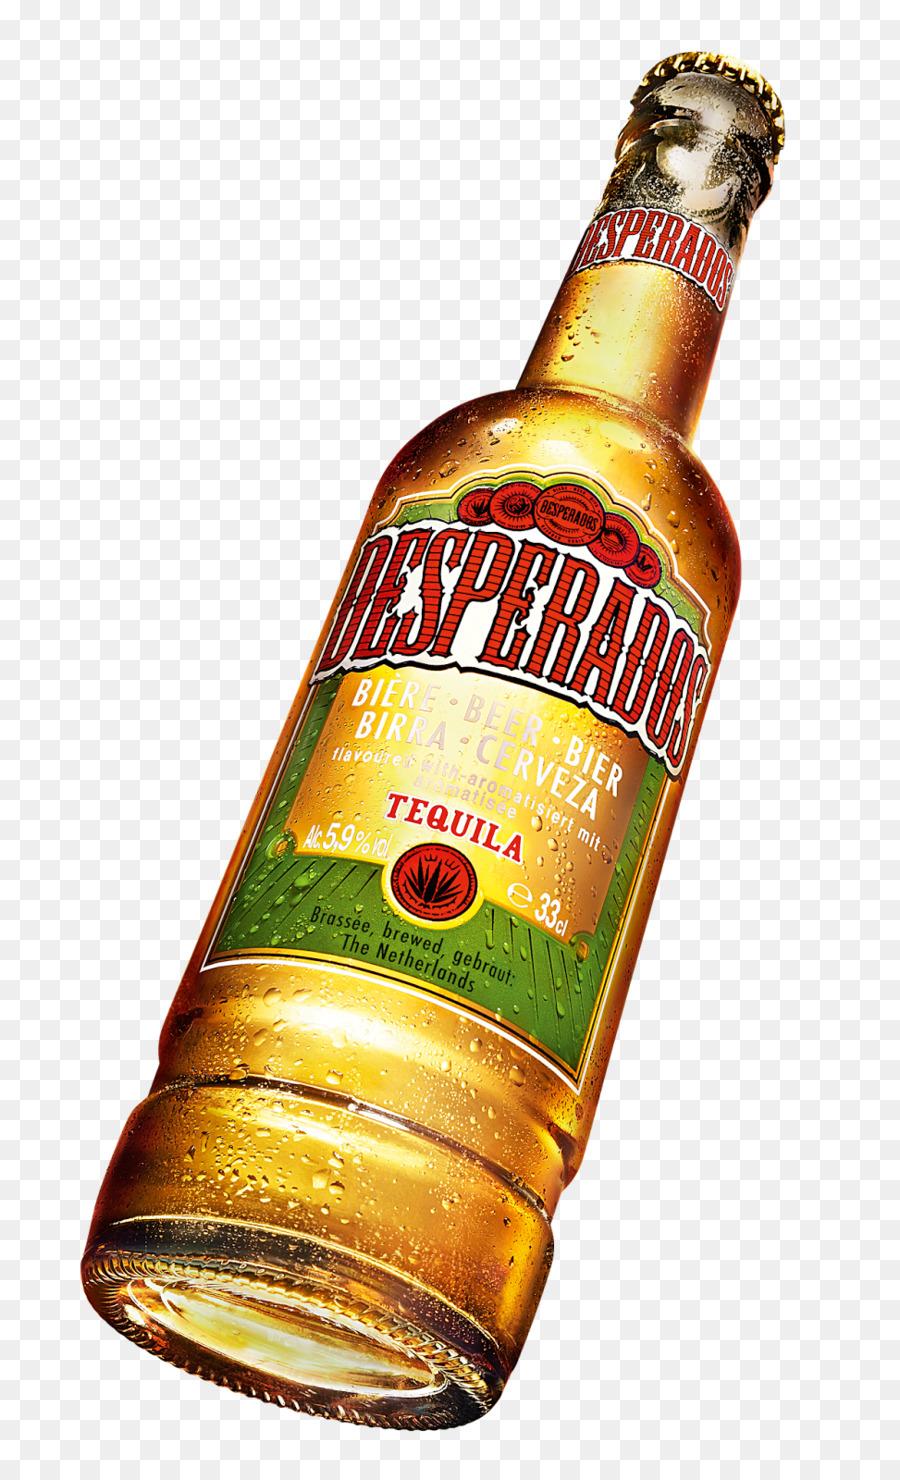 Beer Cartoon Png Download 973 1600 Free Transparent Lager Png Download Cleanpng Kisspng